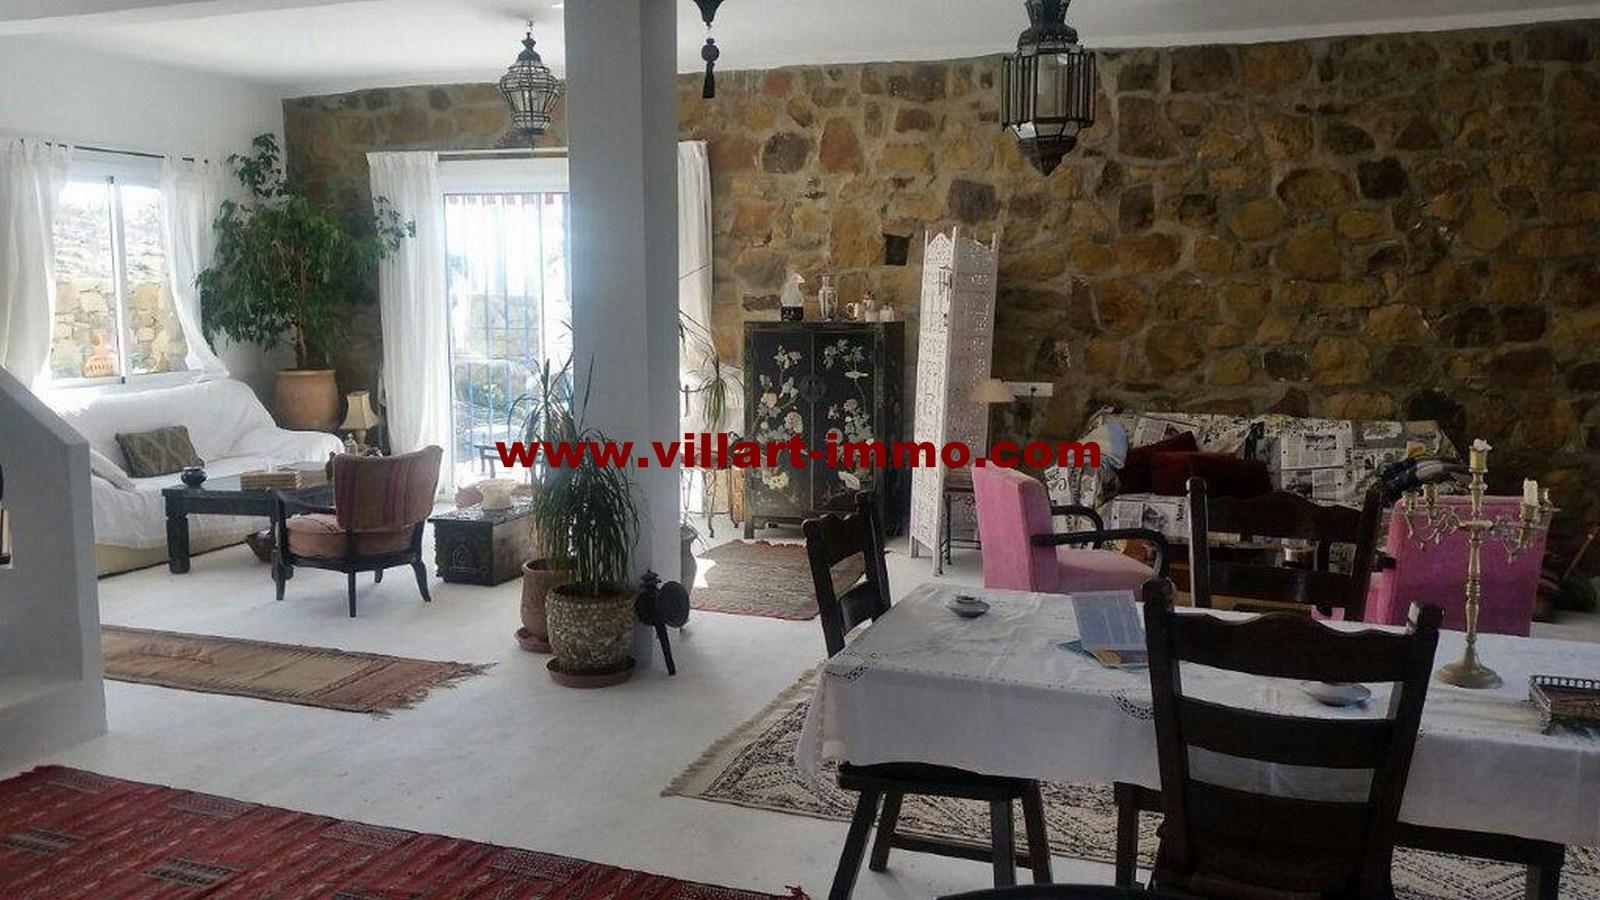 6-vente-villa-tanger-autres-salon-6-vv454-villart-immo